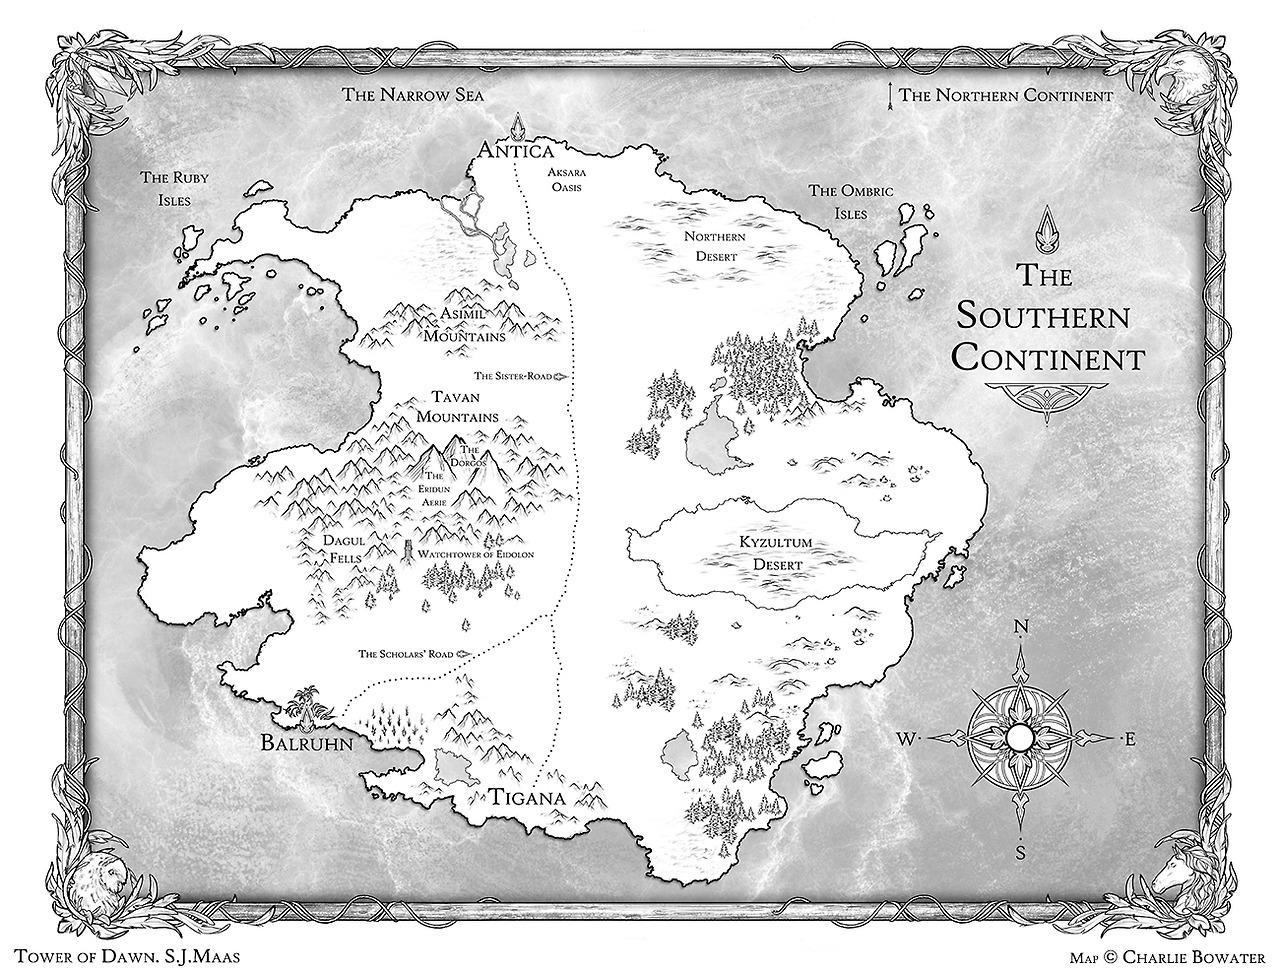 throne of glass world map Antica Throne Of Glass Wiki Fandom